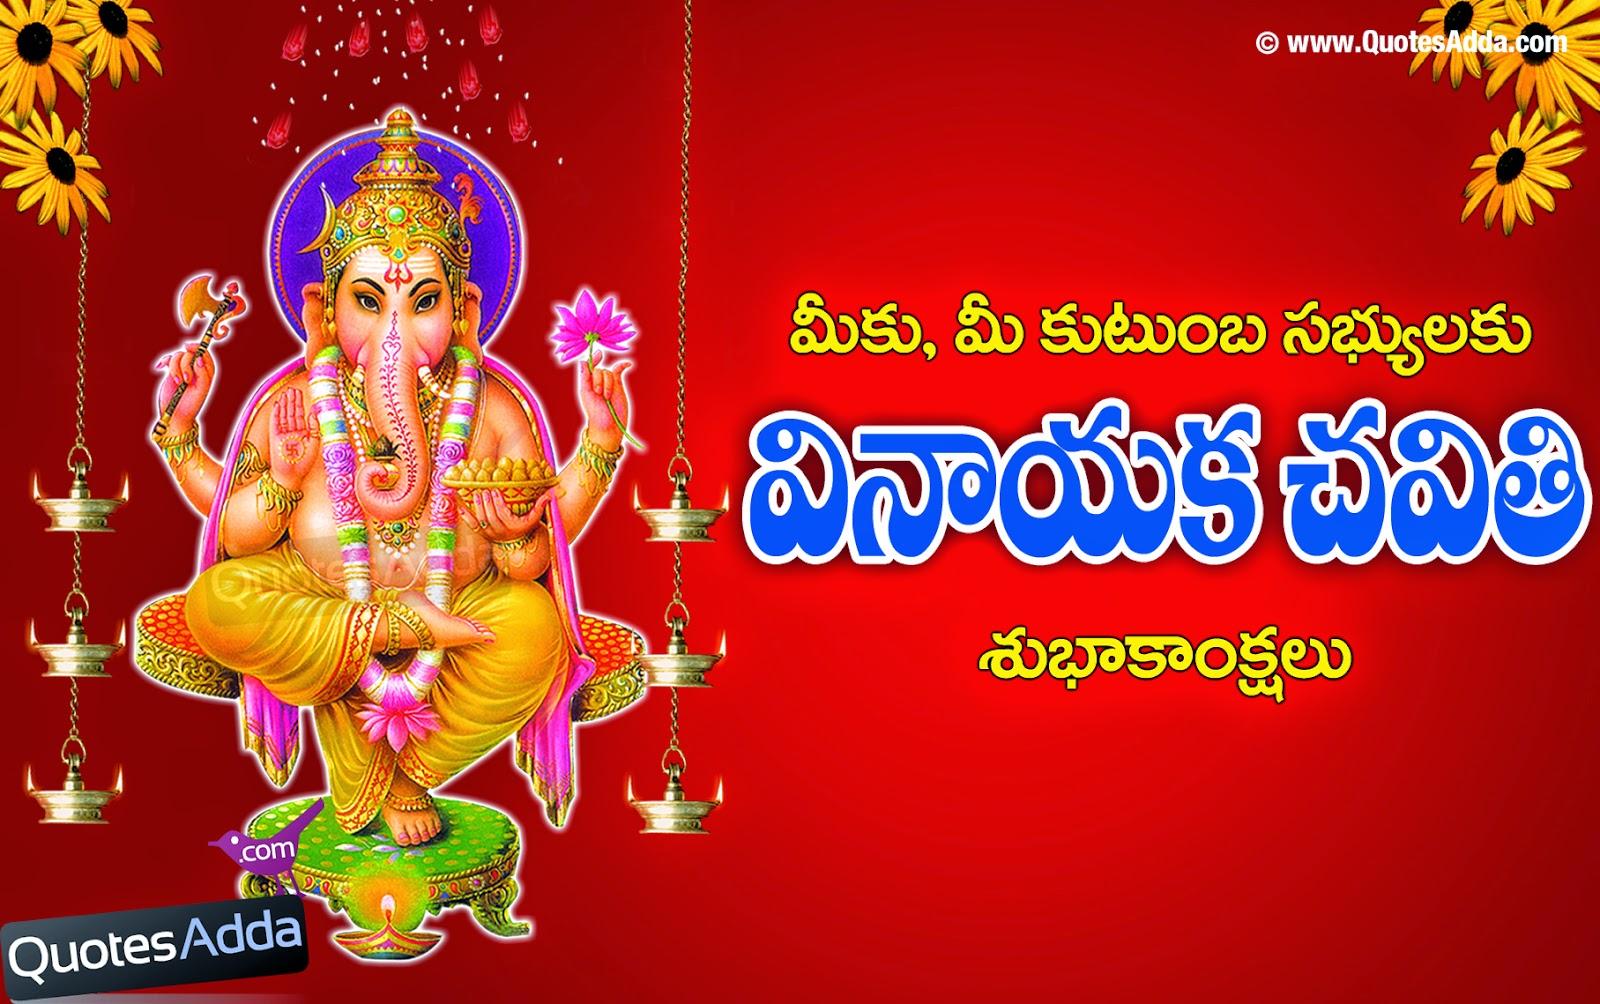 Happy Vinayaka Chavithi Quotes in Telugu   Quotes Adda.com   Telugu ...